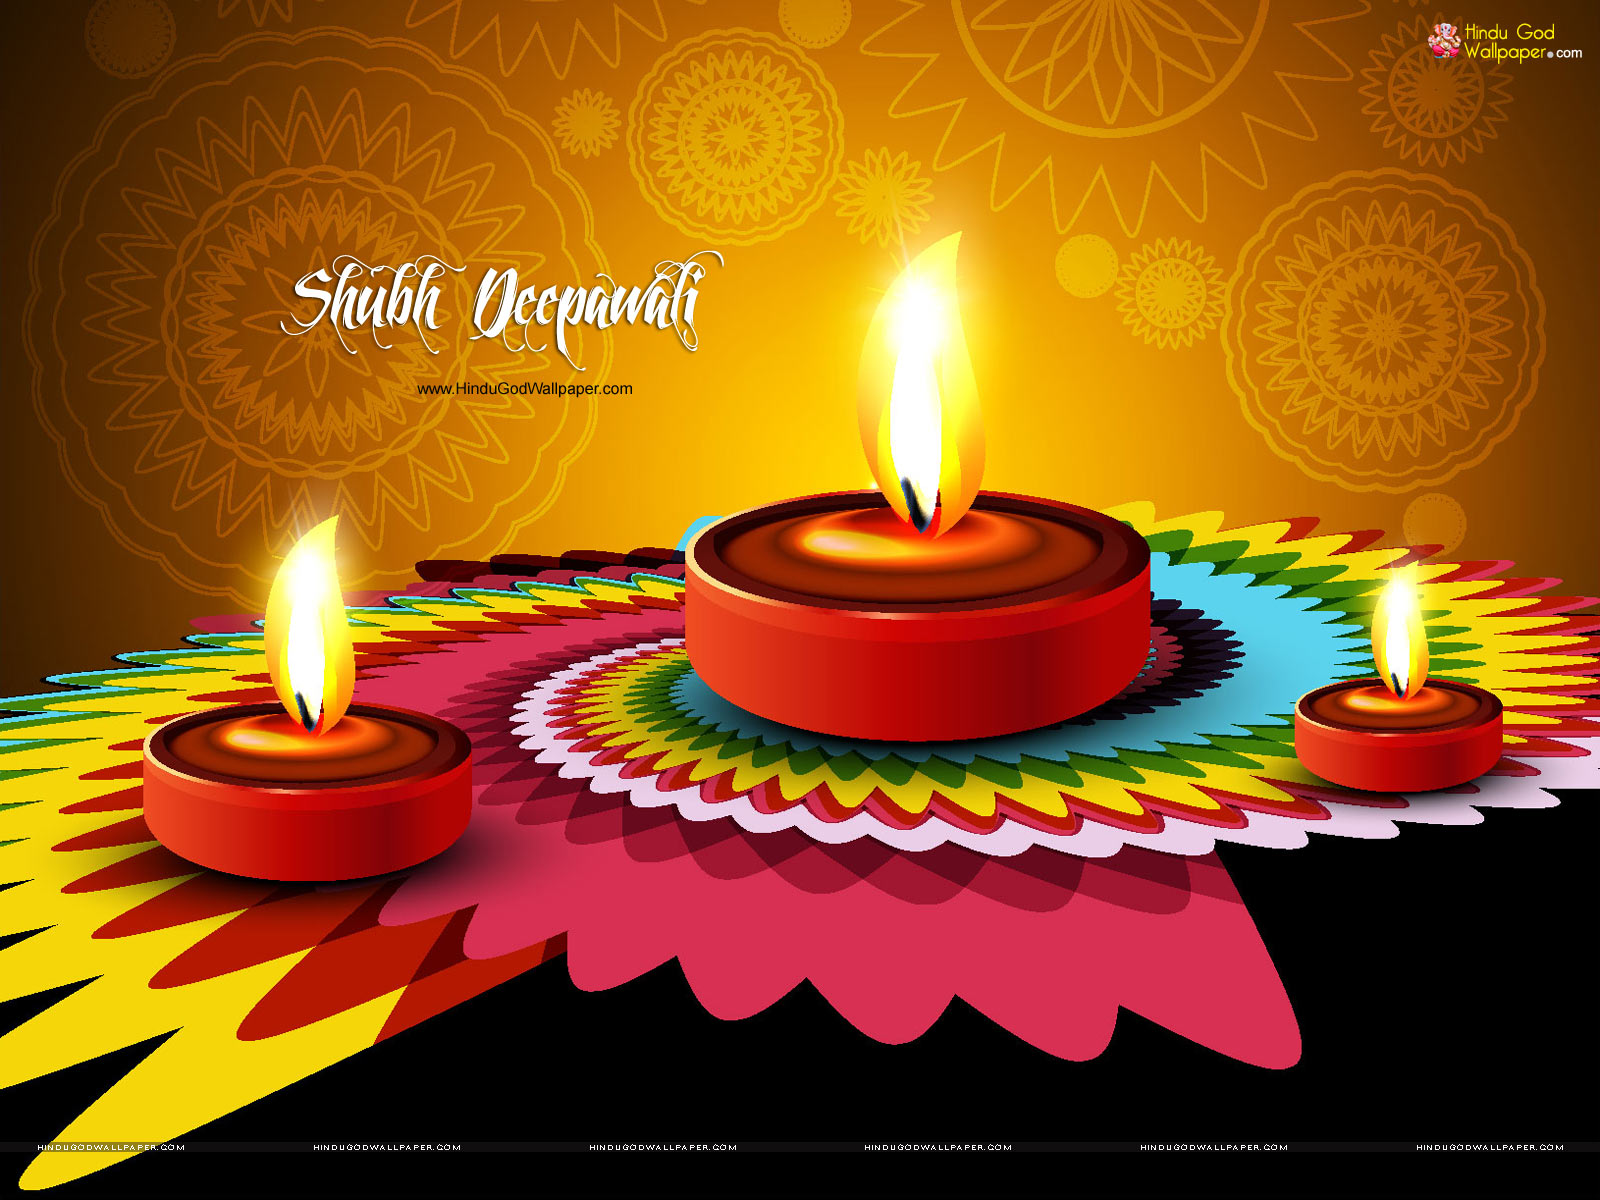 diwali wallpaper hd high